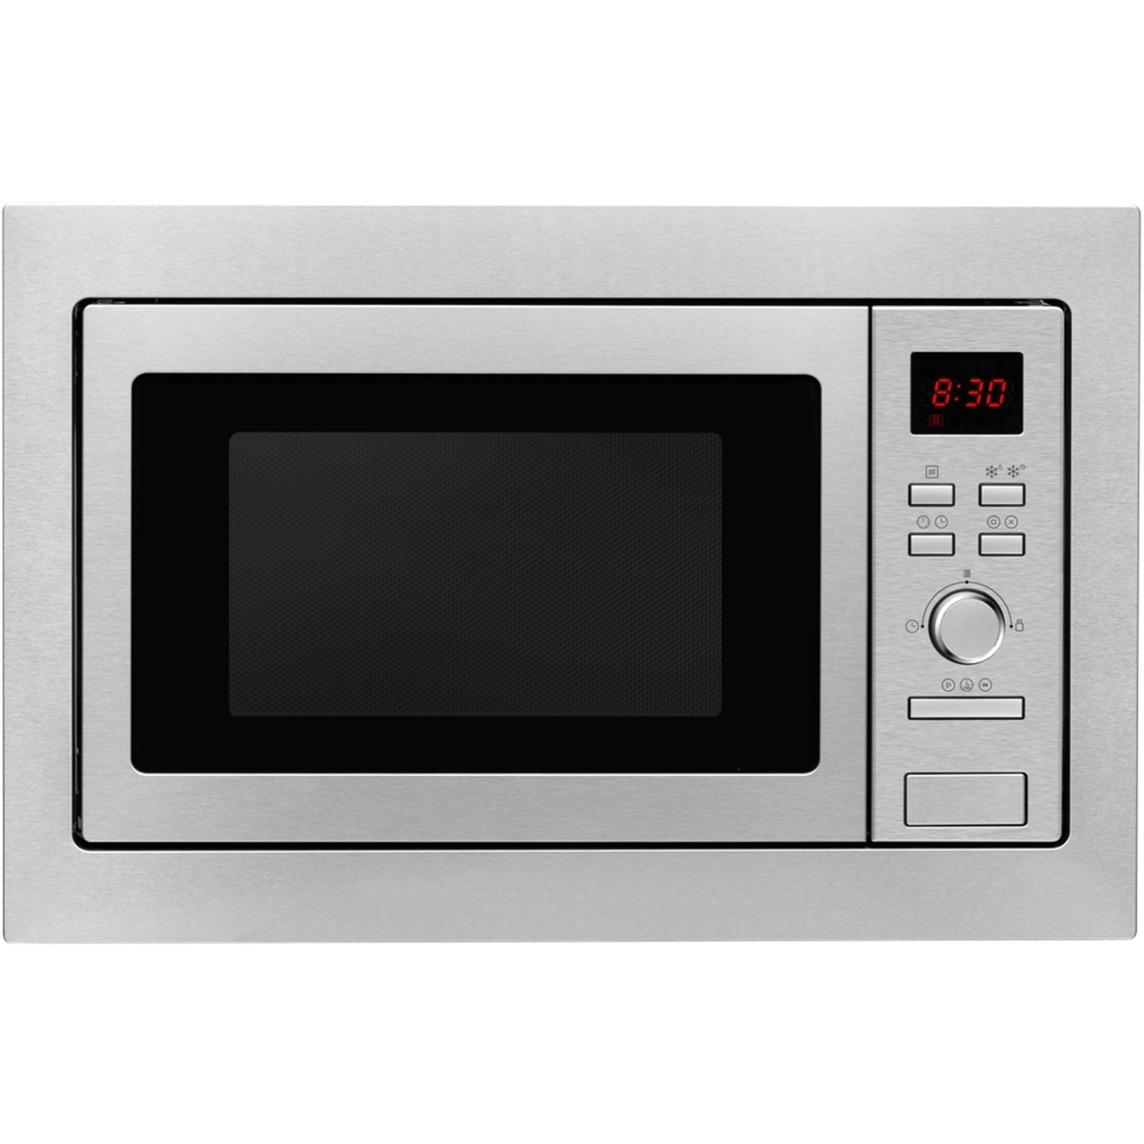 EMW 13181 E Comptoir Micro-ondes grill 20L 800W Acier inoxydable, Four à micro-ondes